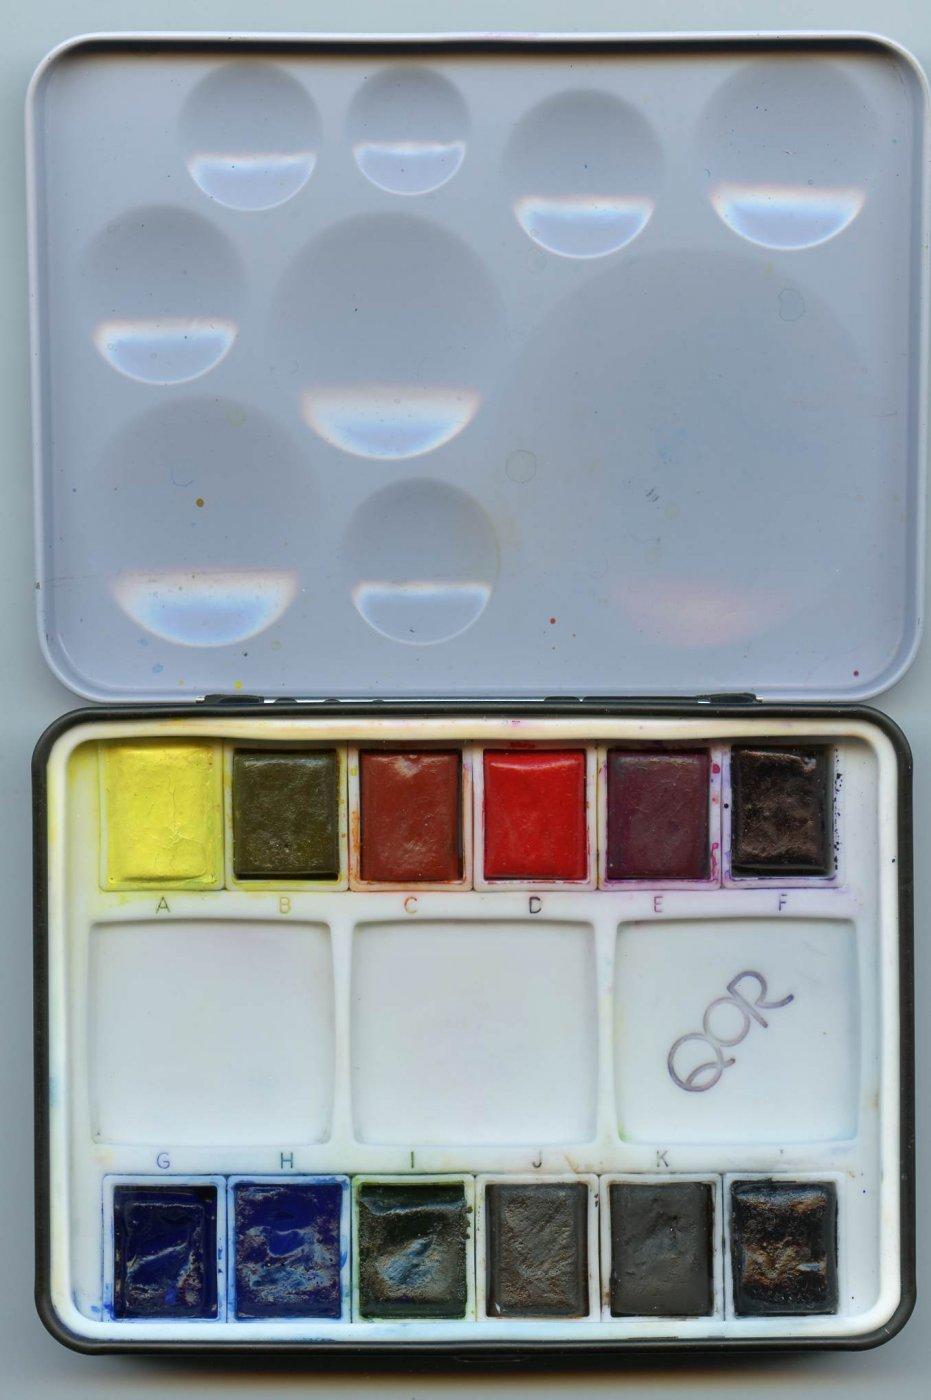 QoR Mini Palette Interior View